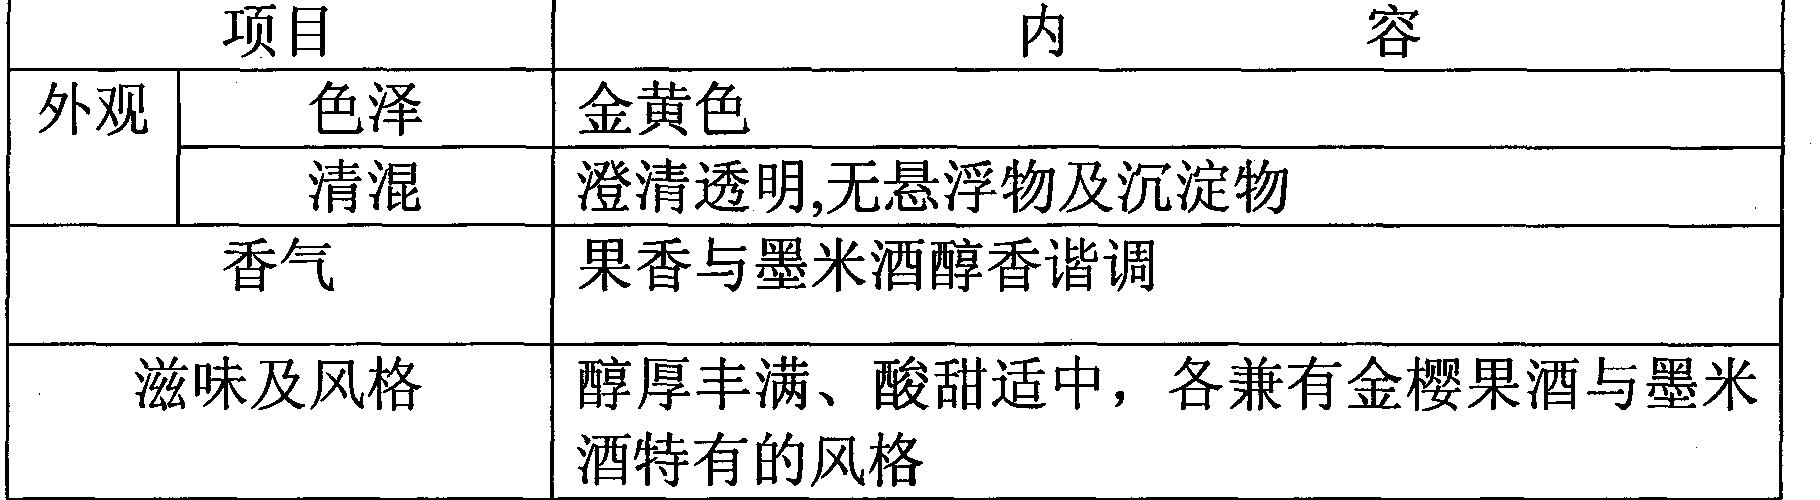 Figure CN104560525AD00051